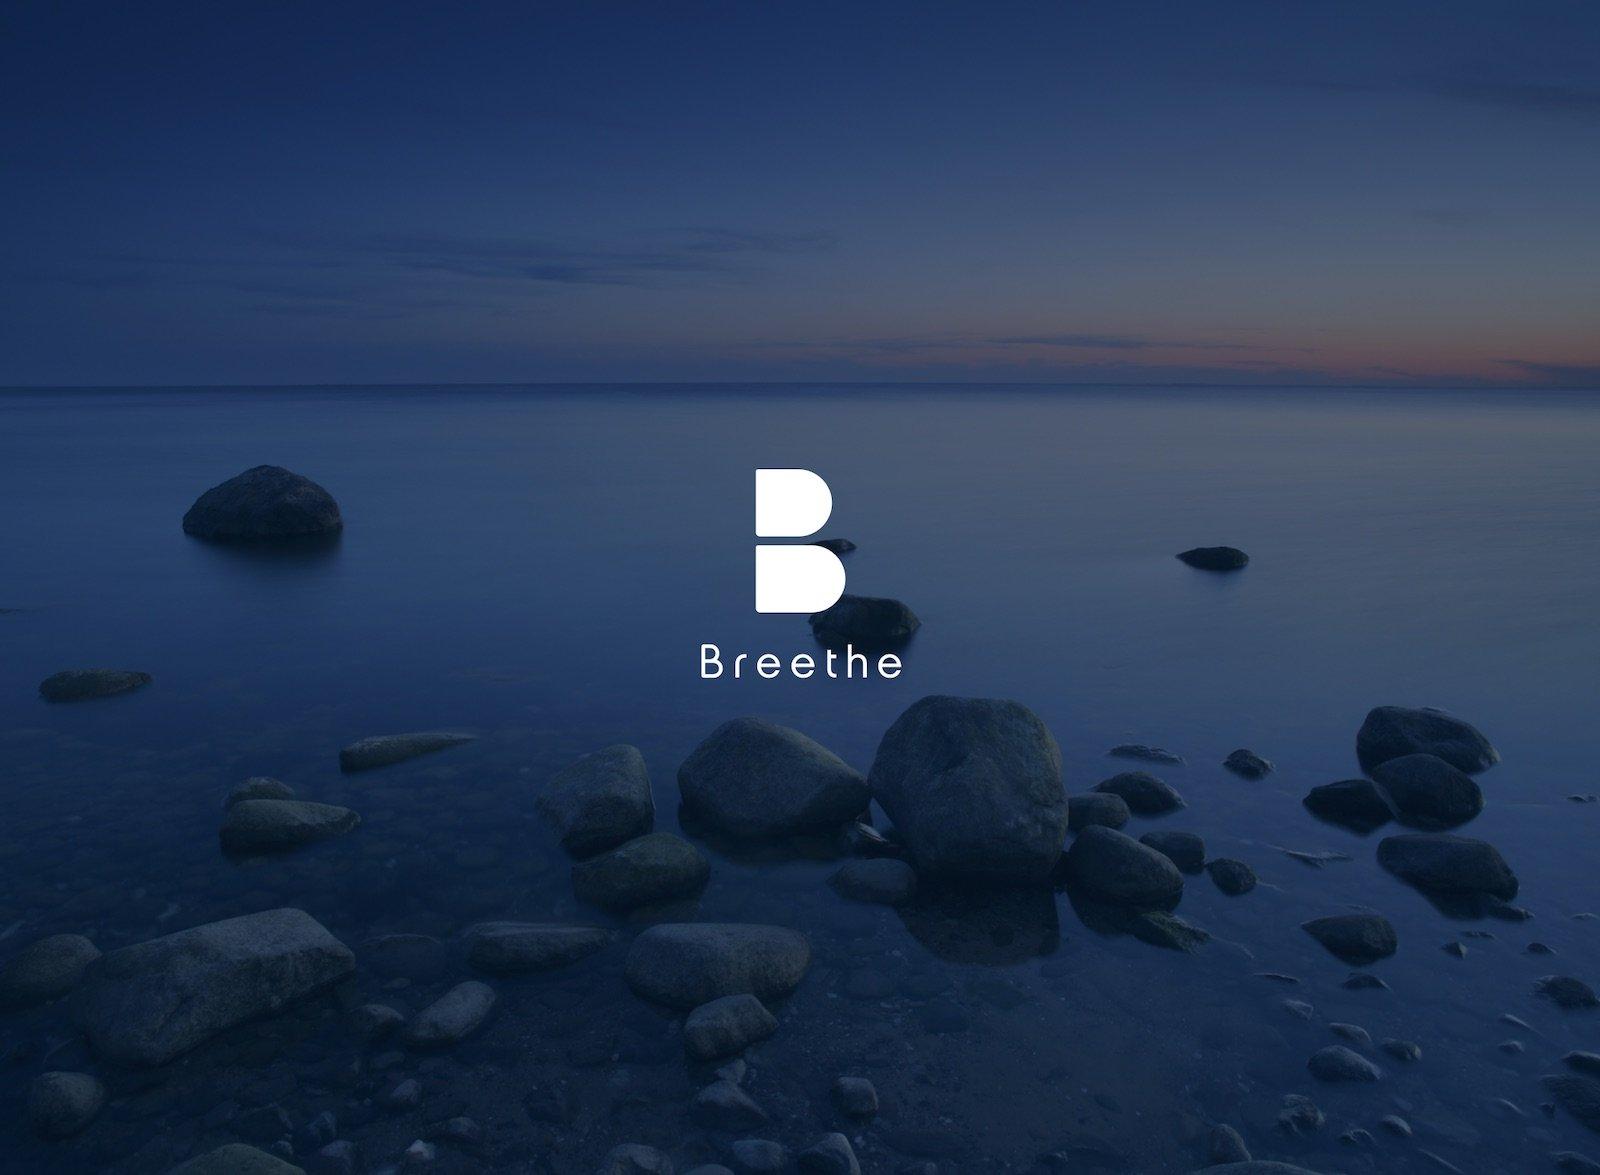 Review: Breethe – Calm Meditation & Sleep Sounds